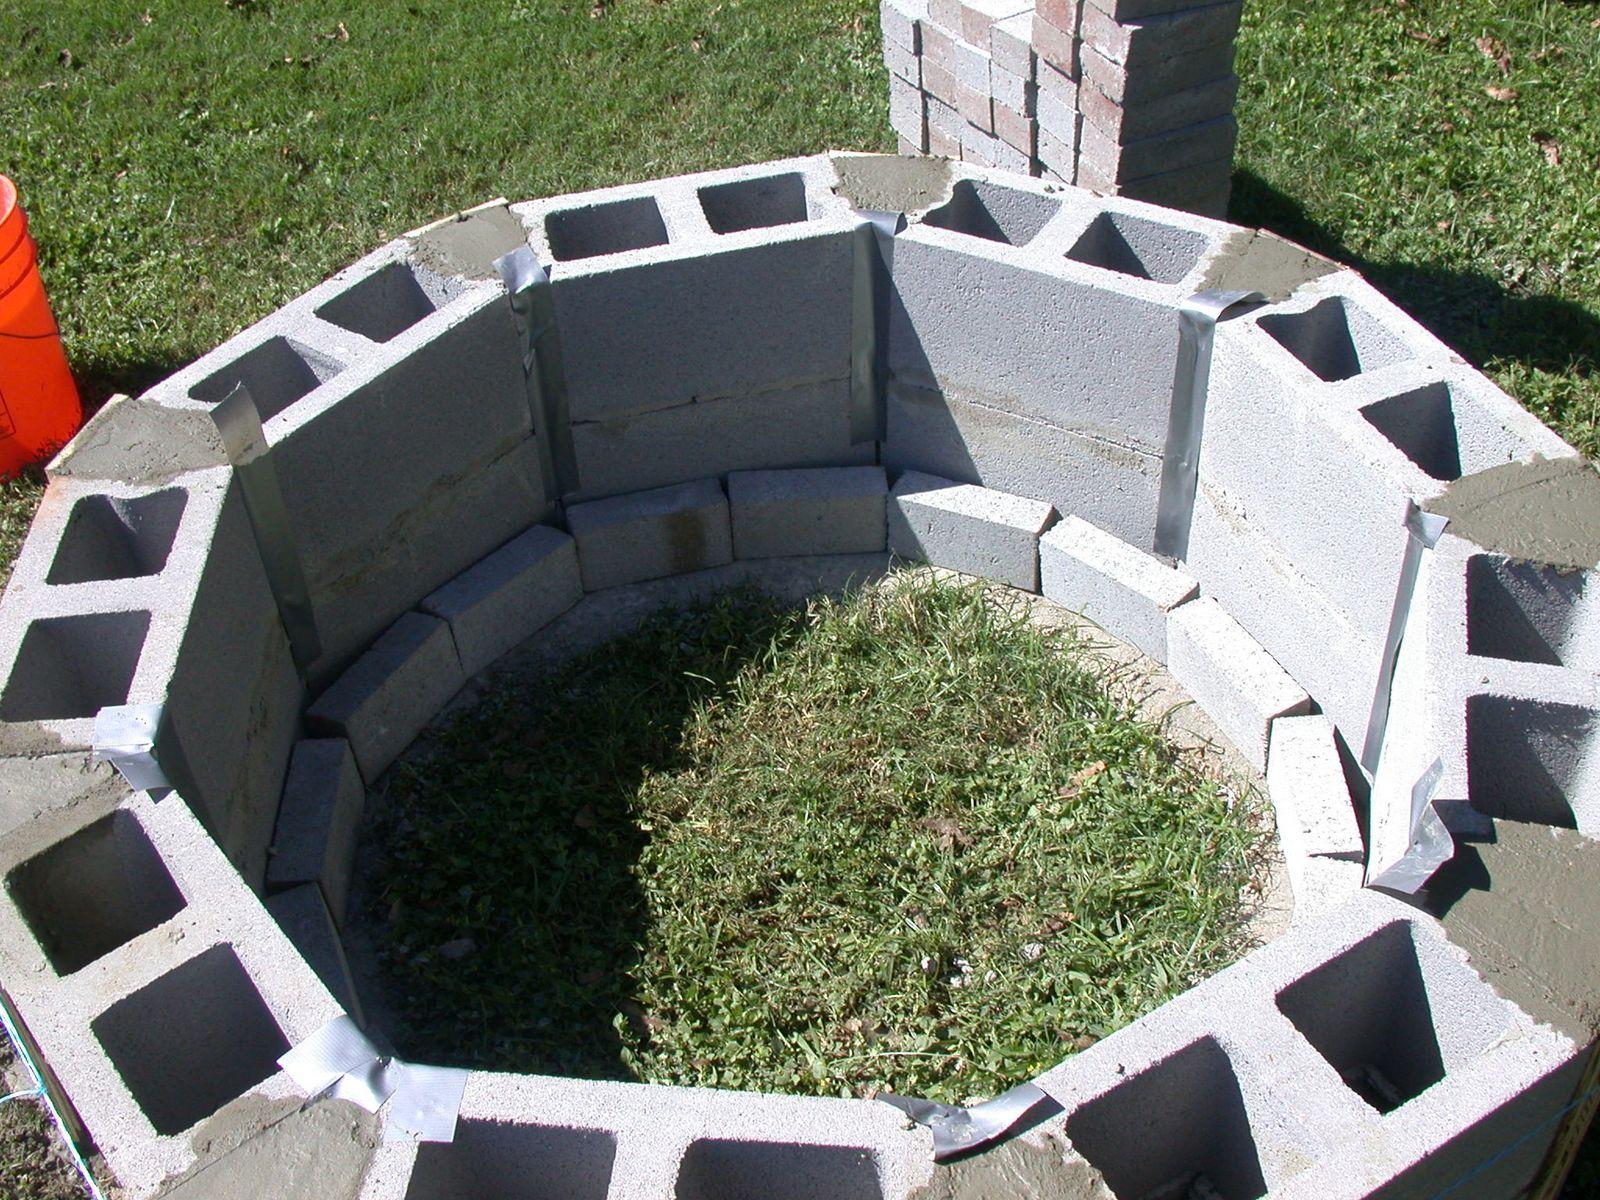 Photo Google Cinder Block Fire Pit Outdoor Fire Pit Designs